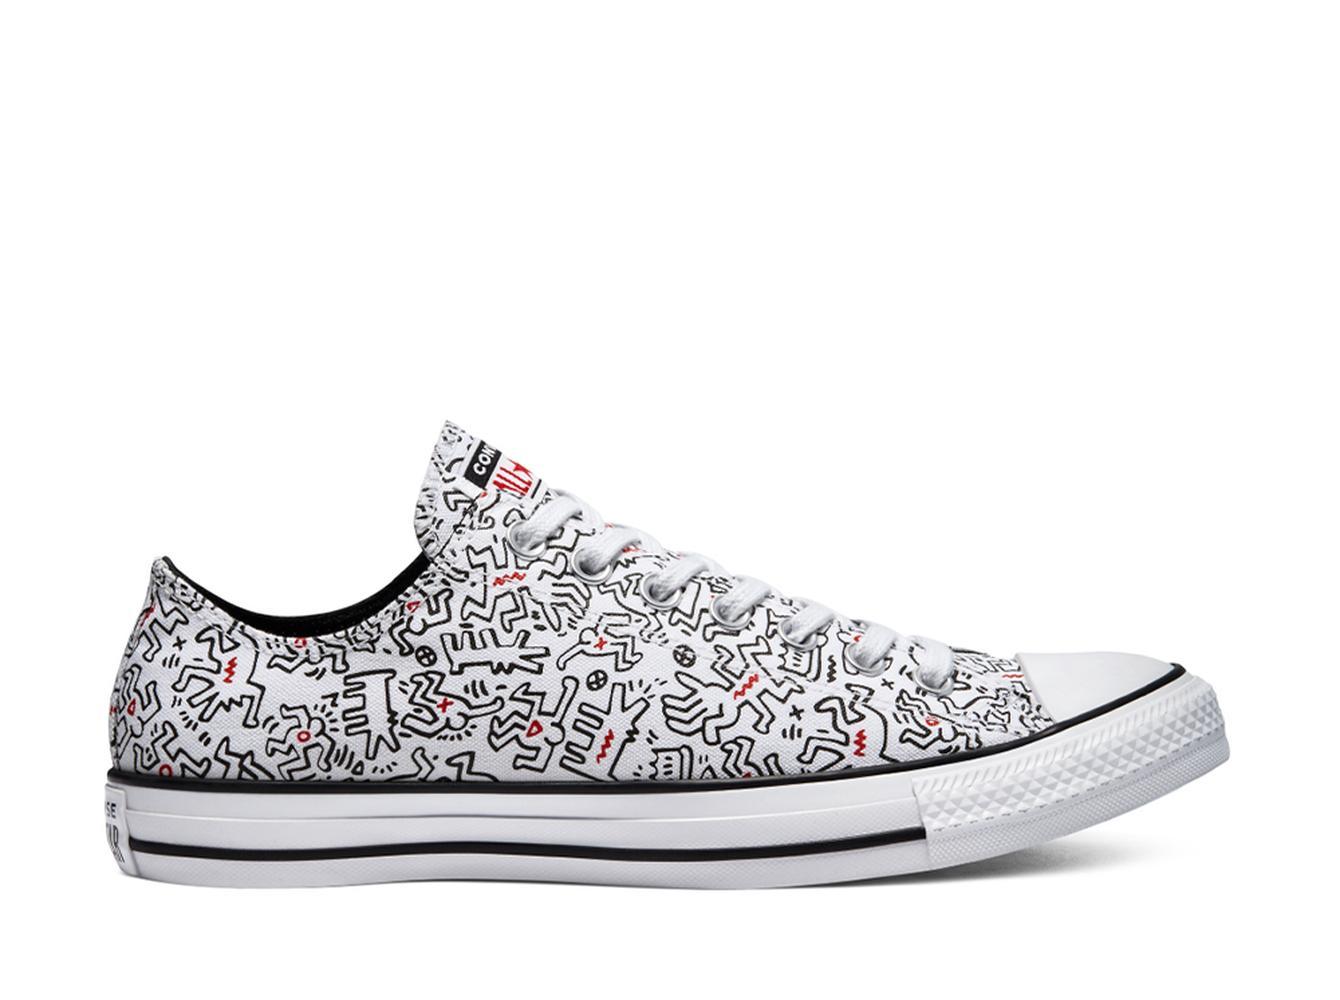 Converse x Keith Haring Chuck Taylor All Star